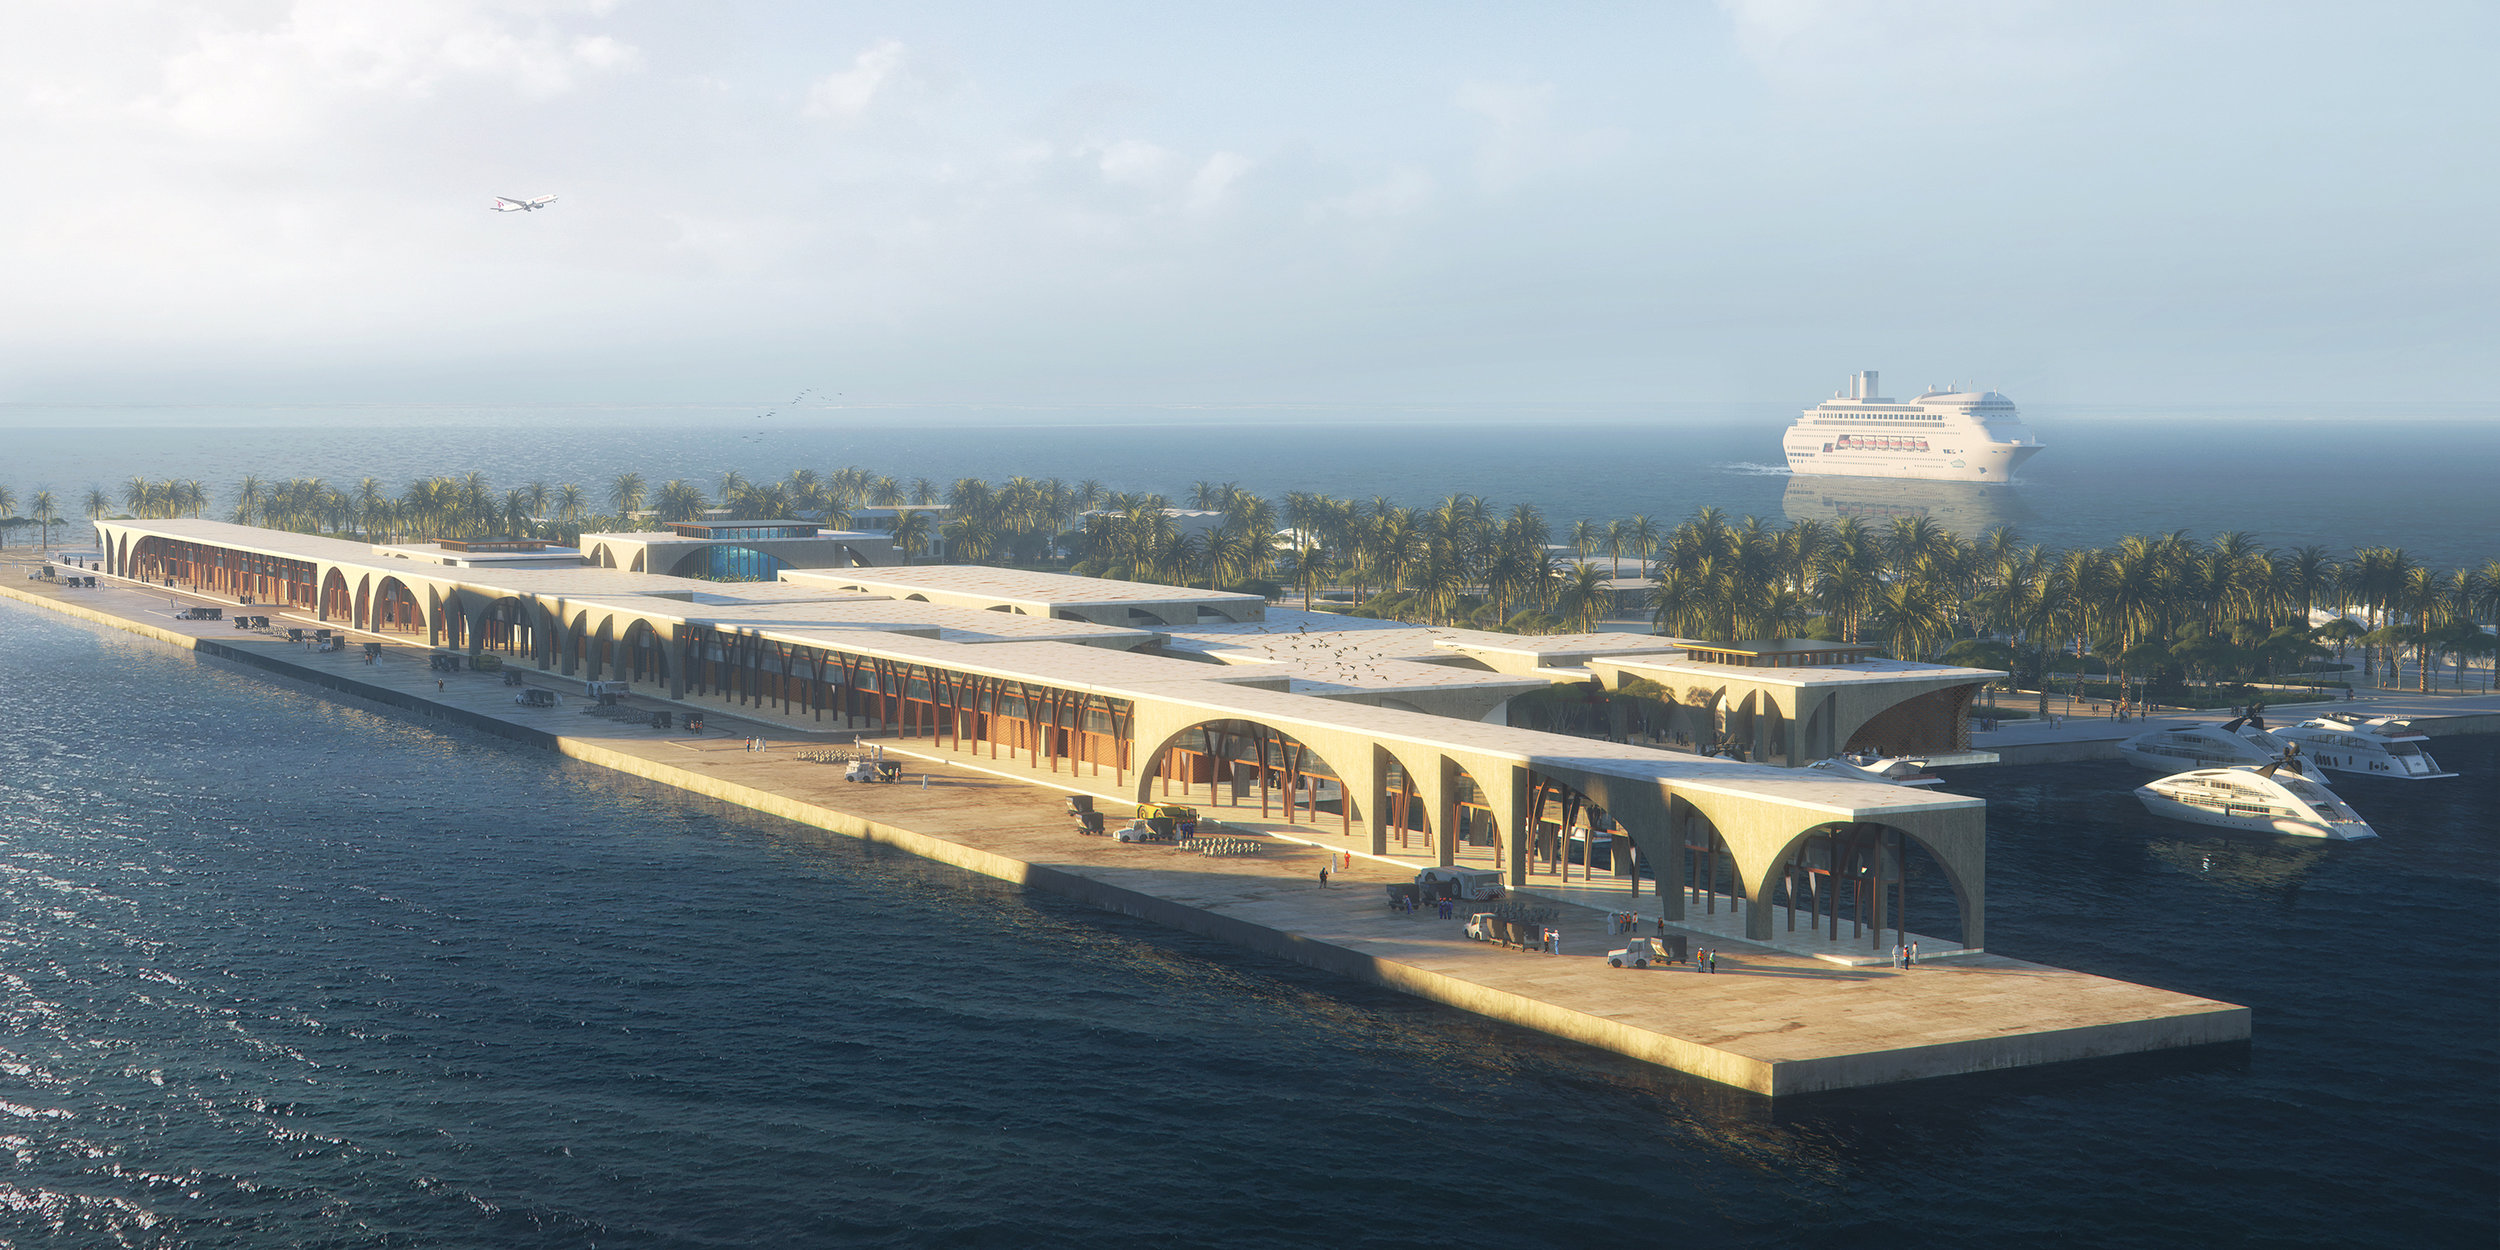 WoodsBagot - Doha - Terminal - Serenity - Copyrights - www.mozses.com.jpg